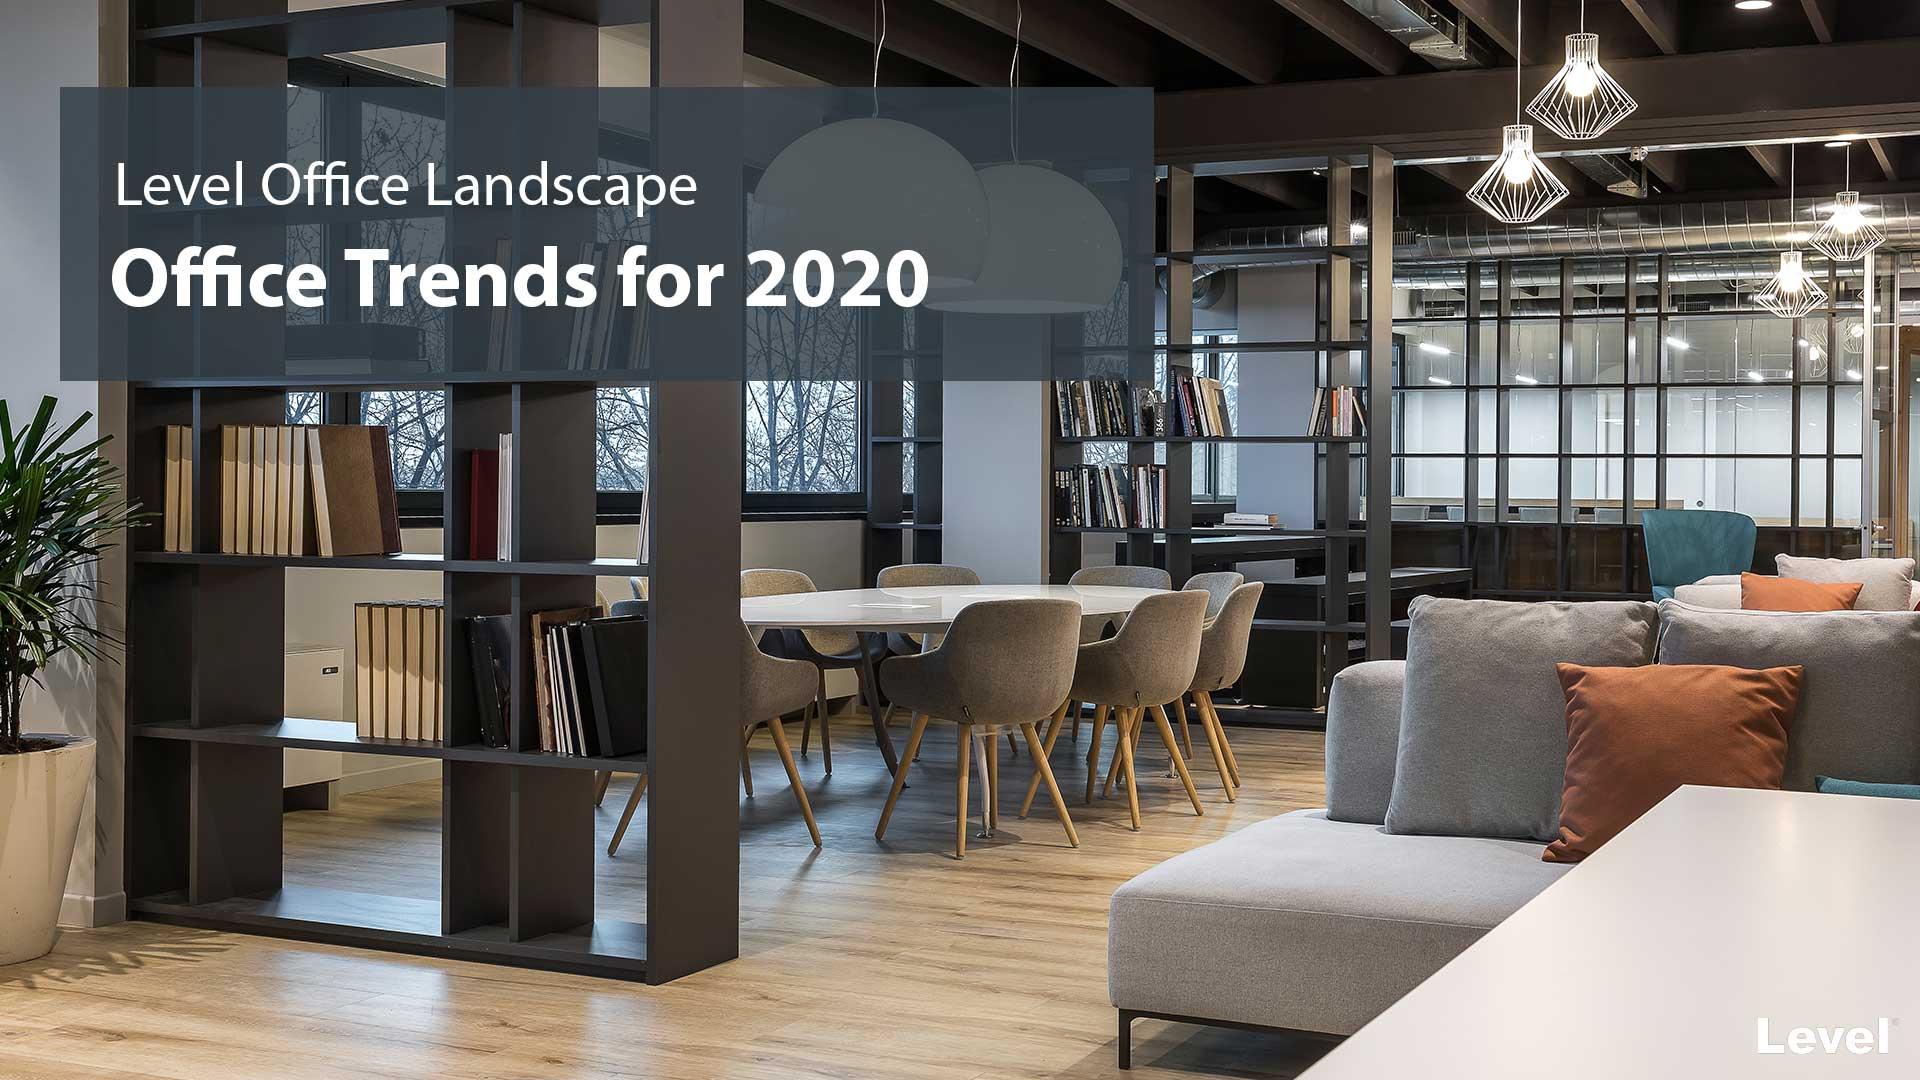 Office-Design-Trends-2020-Level-Office-Landscape